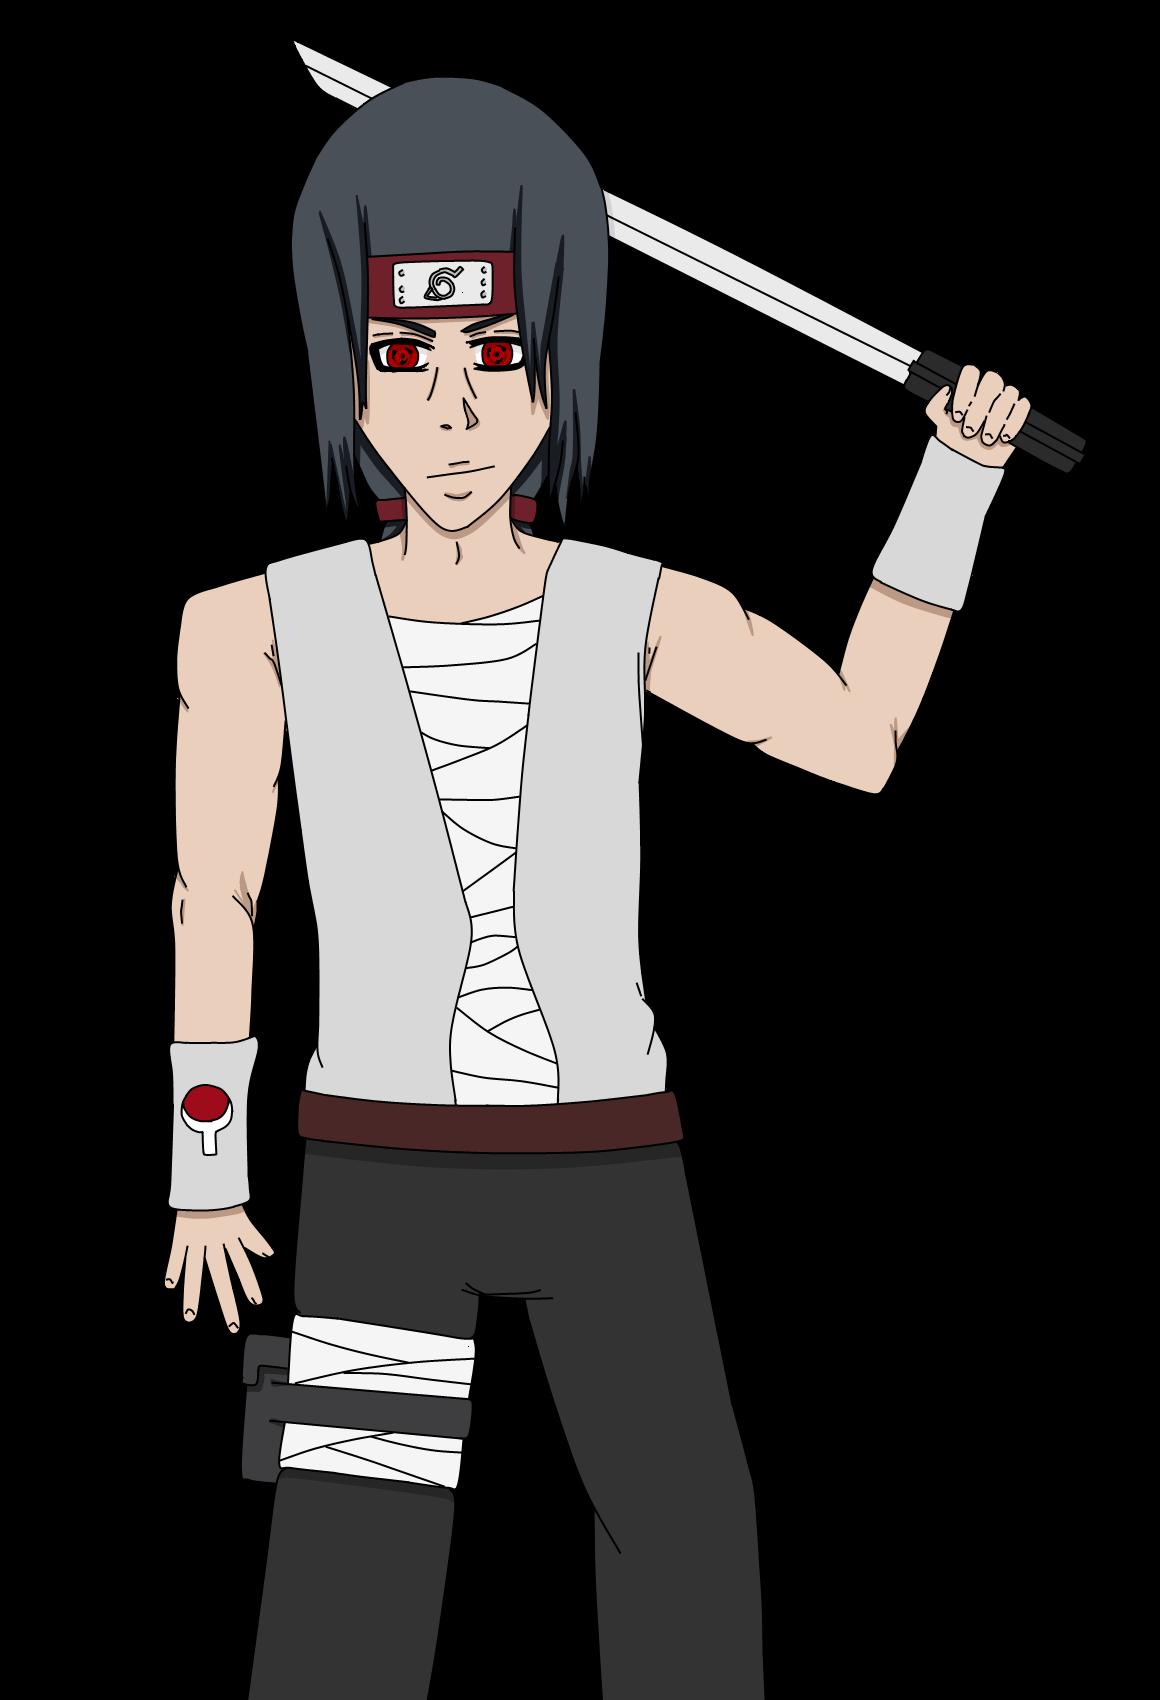 Naruto NEXT-GEN: Itachi COLORED by stillers on deviantART - Itachi Brother